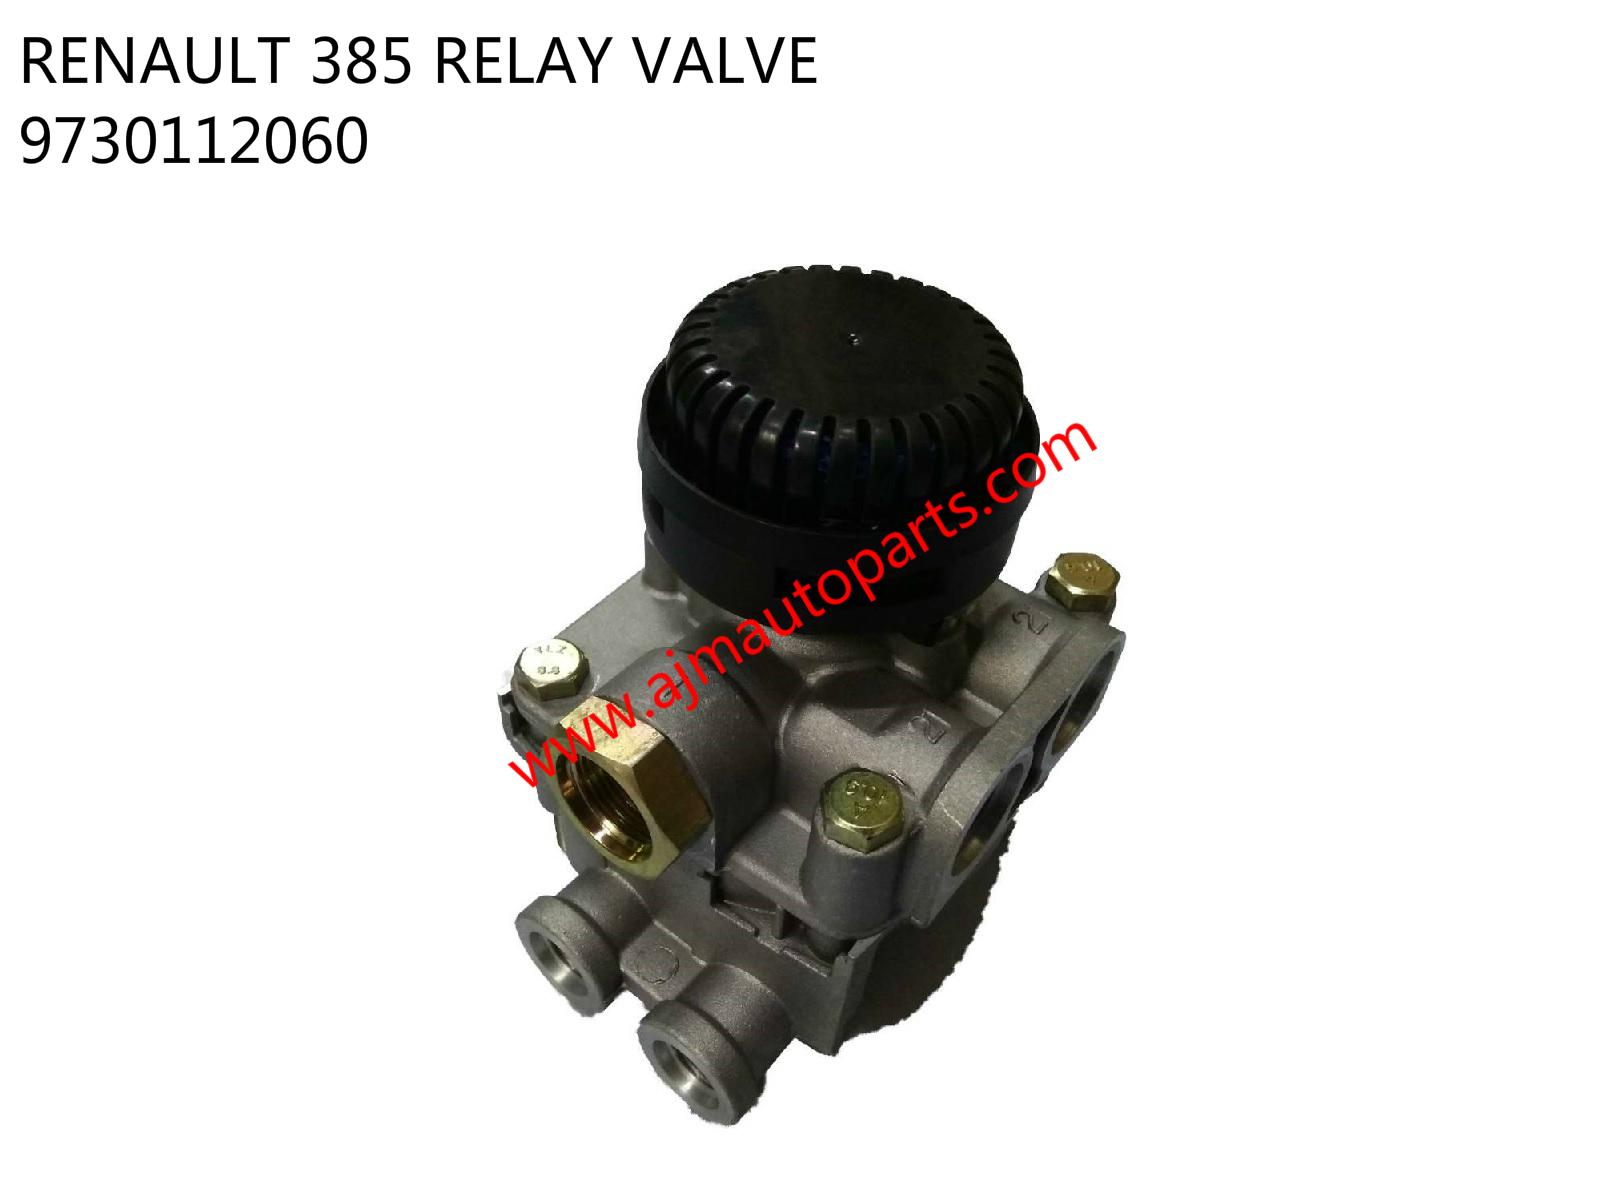 RENAULT 385 RELAY VALVE-9730112060